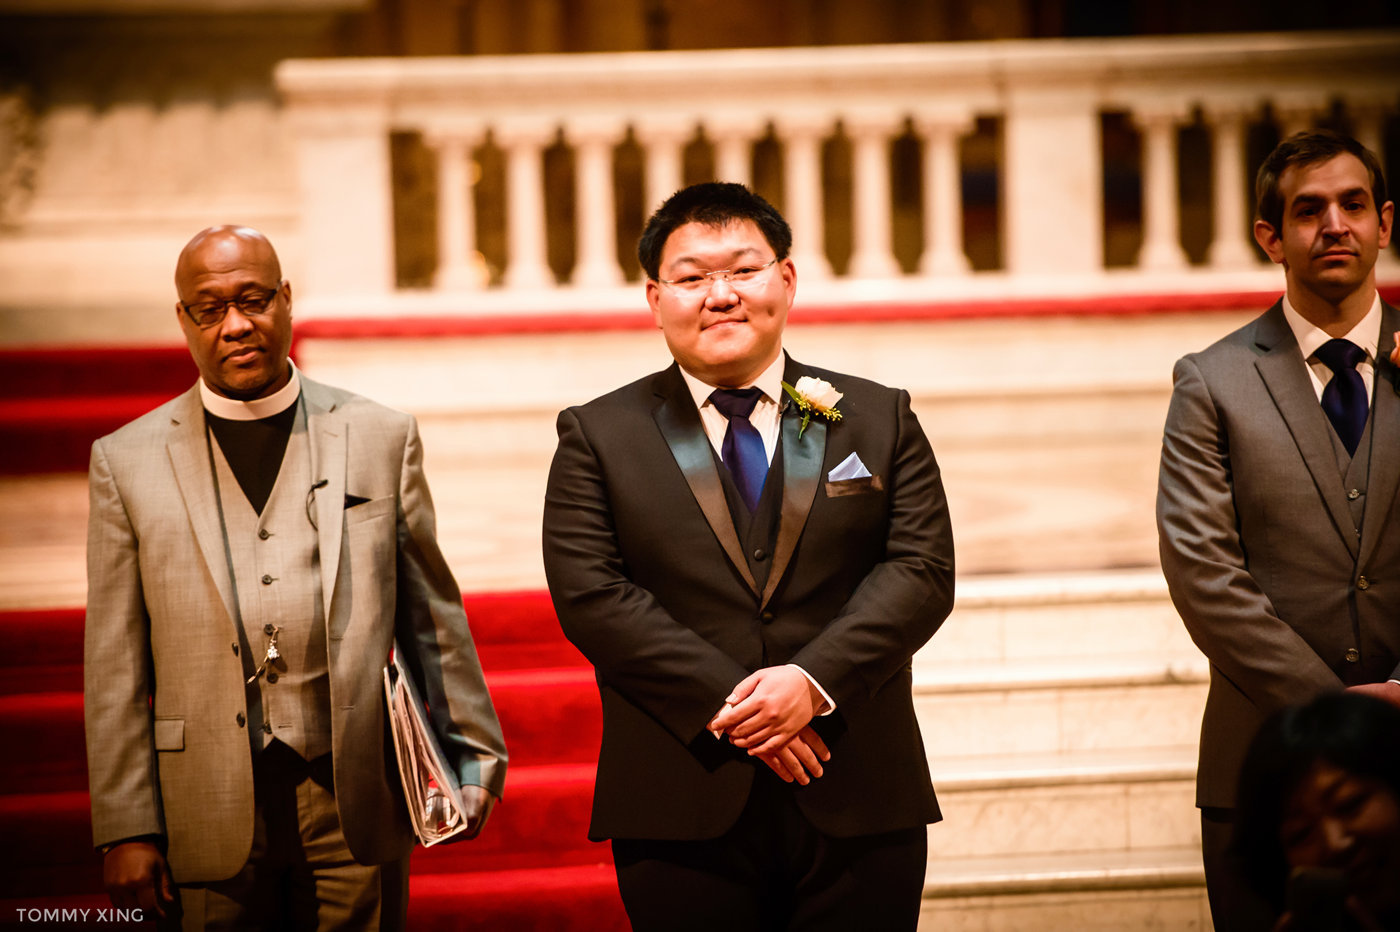 STANFORD MEMORIAL CHURCH WEDDING - Wenjie & Chengcheng - SAN FRANCISCO BAY AREA 斯坦福教堂婚礼跟拍 - 洛杉矶婚礼婚纱照摄影师 Tommy Xing Photography068.jpg